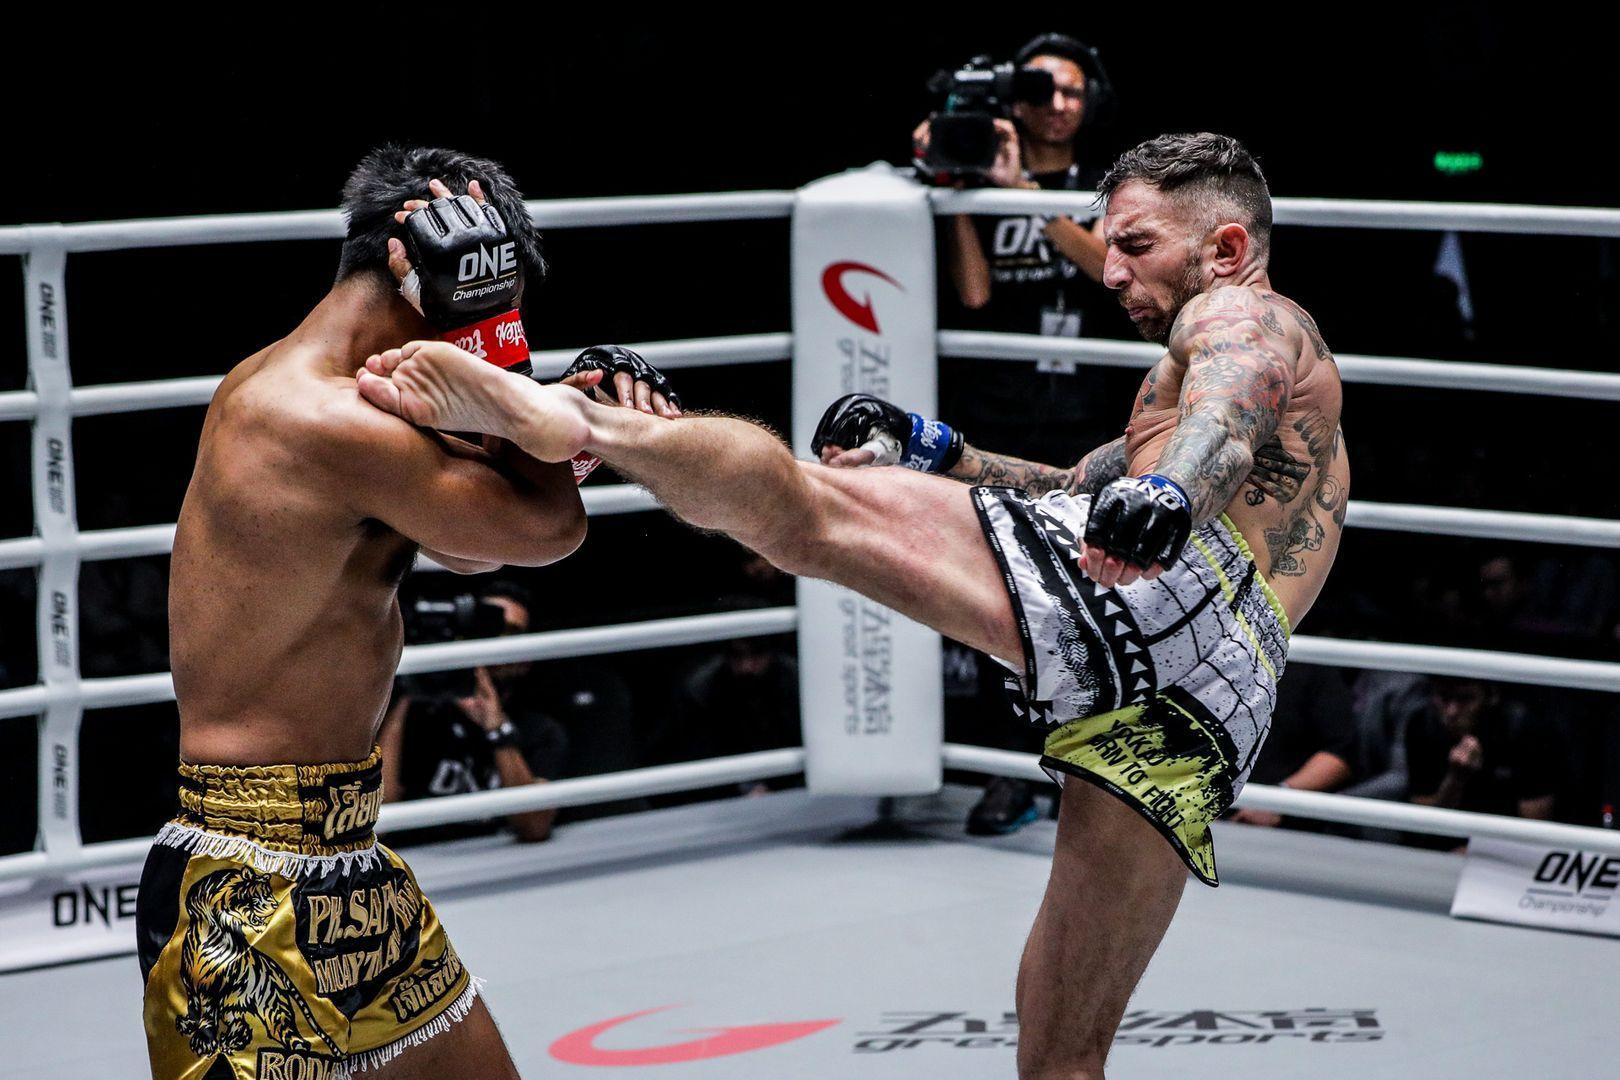 British Muay Thai World Champion Liam Harrison goes for a head kick on Rodlek